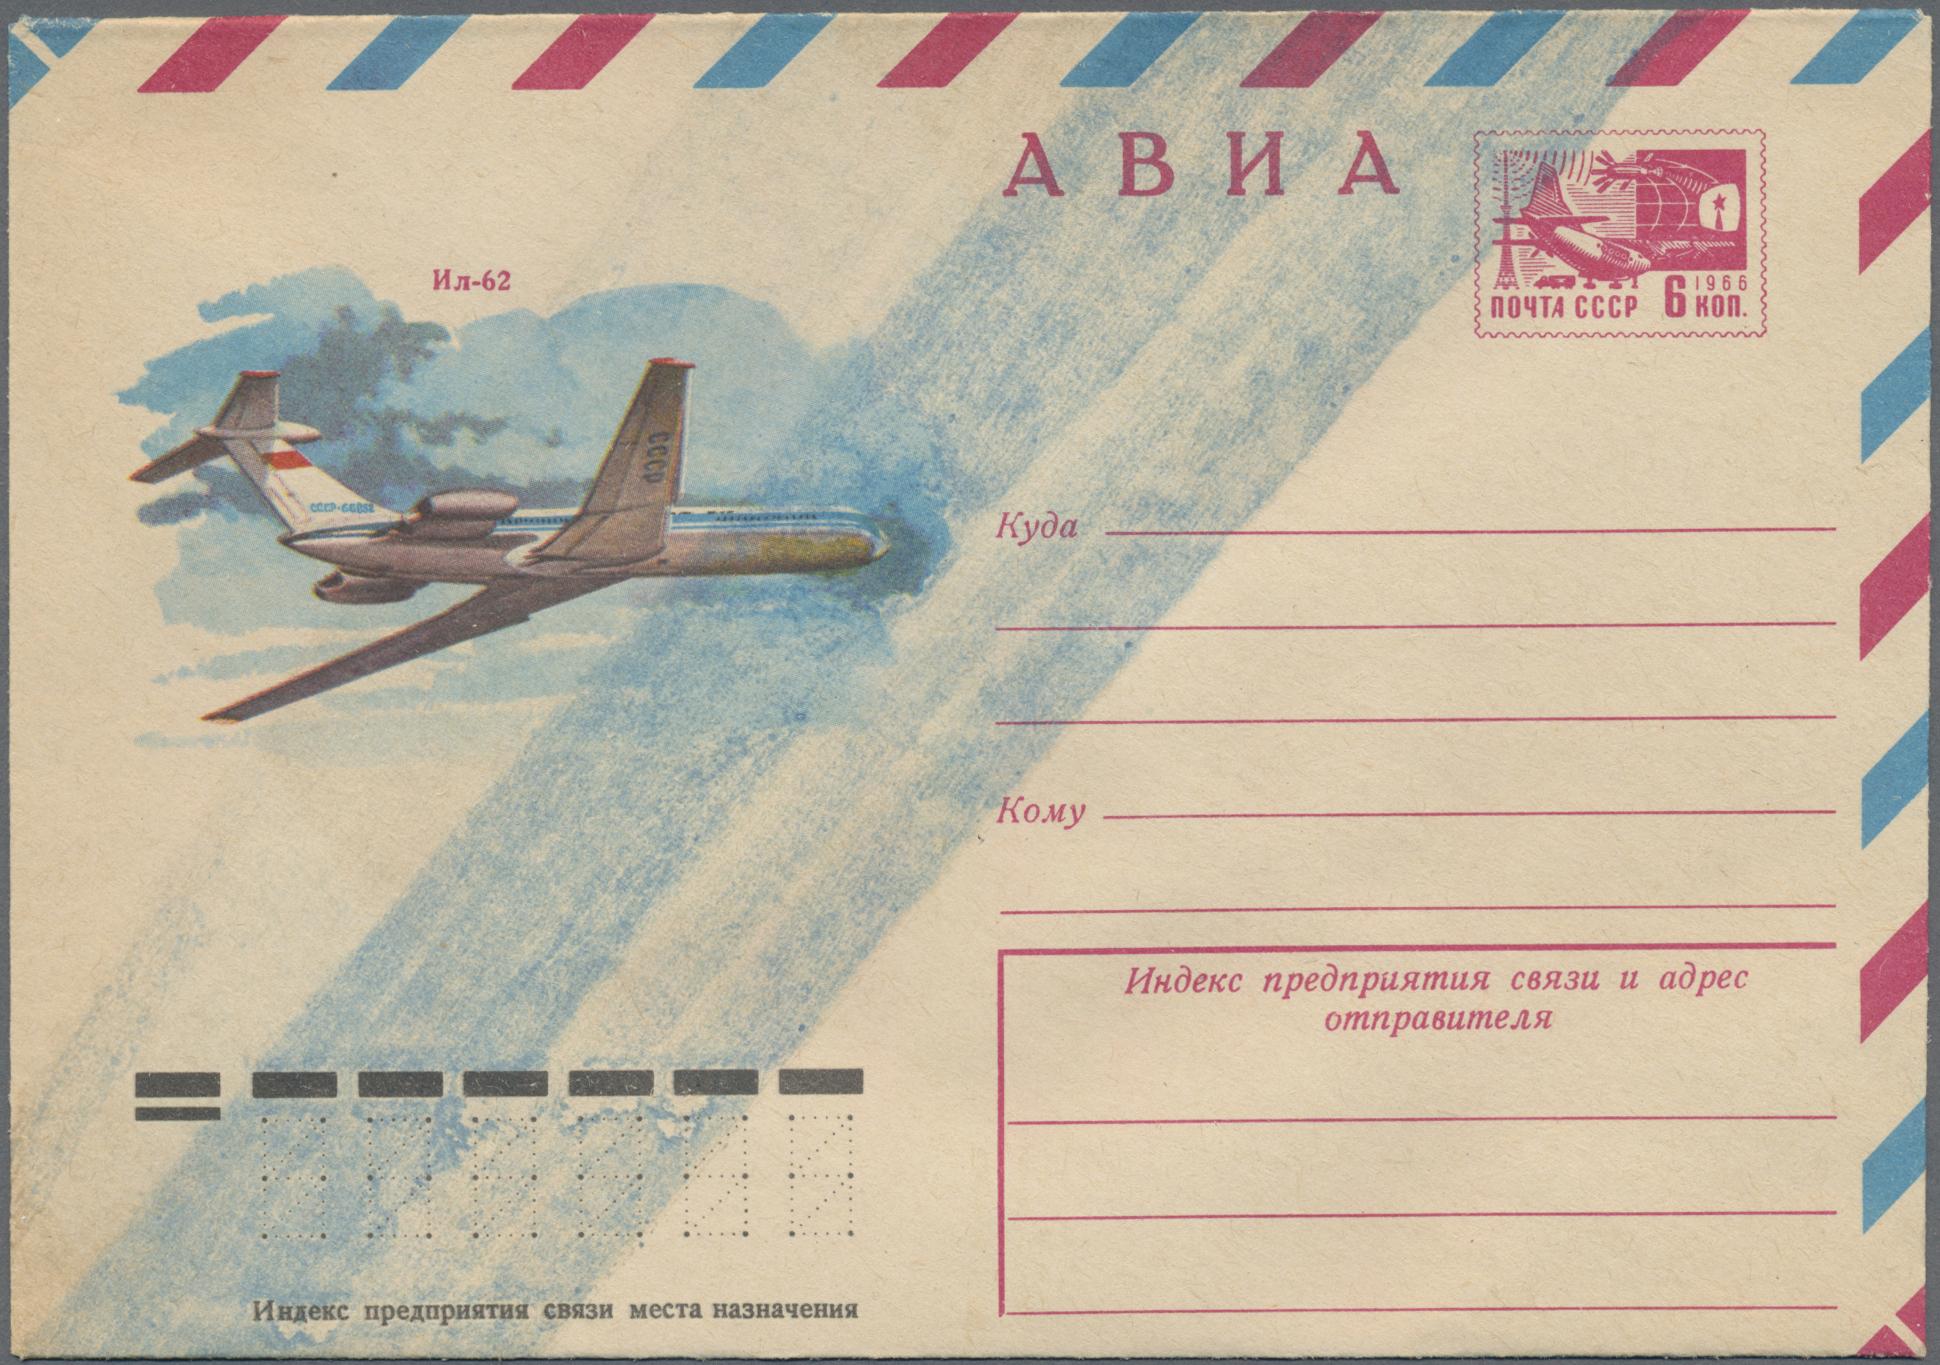 Lot 01773 - Sowjetunion - Ganzsachen  -  Auktionshaus Christoph Gärtner GmbH & Co. KG Special auction